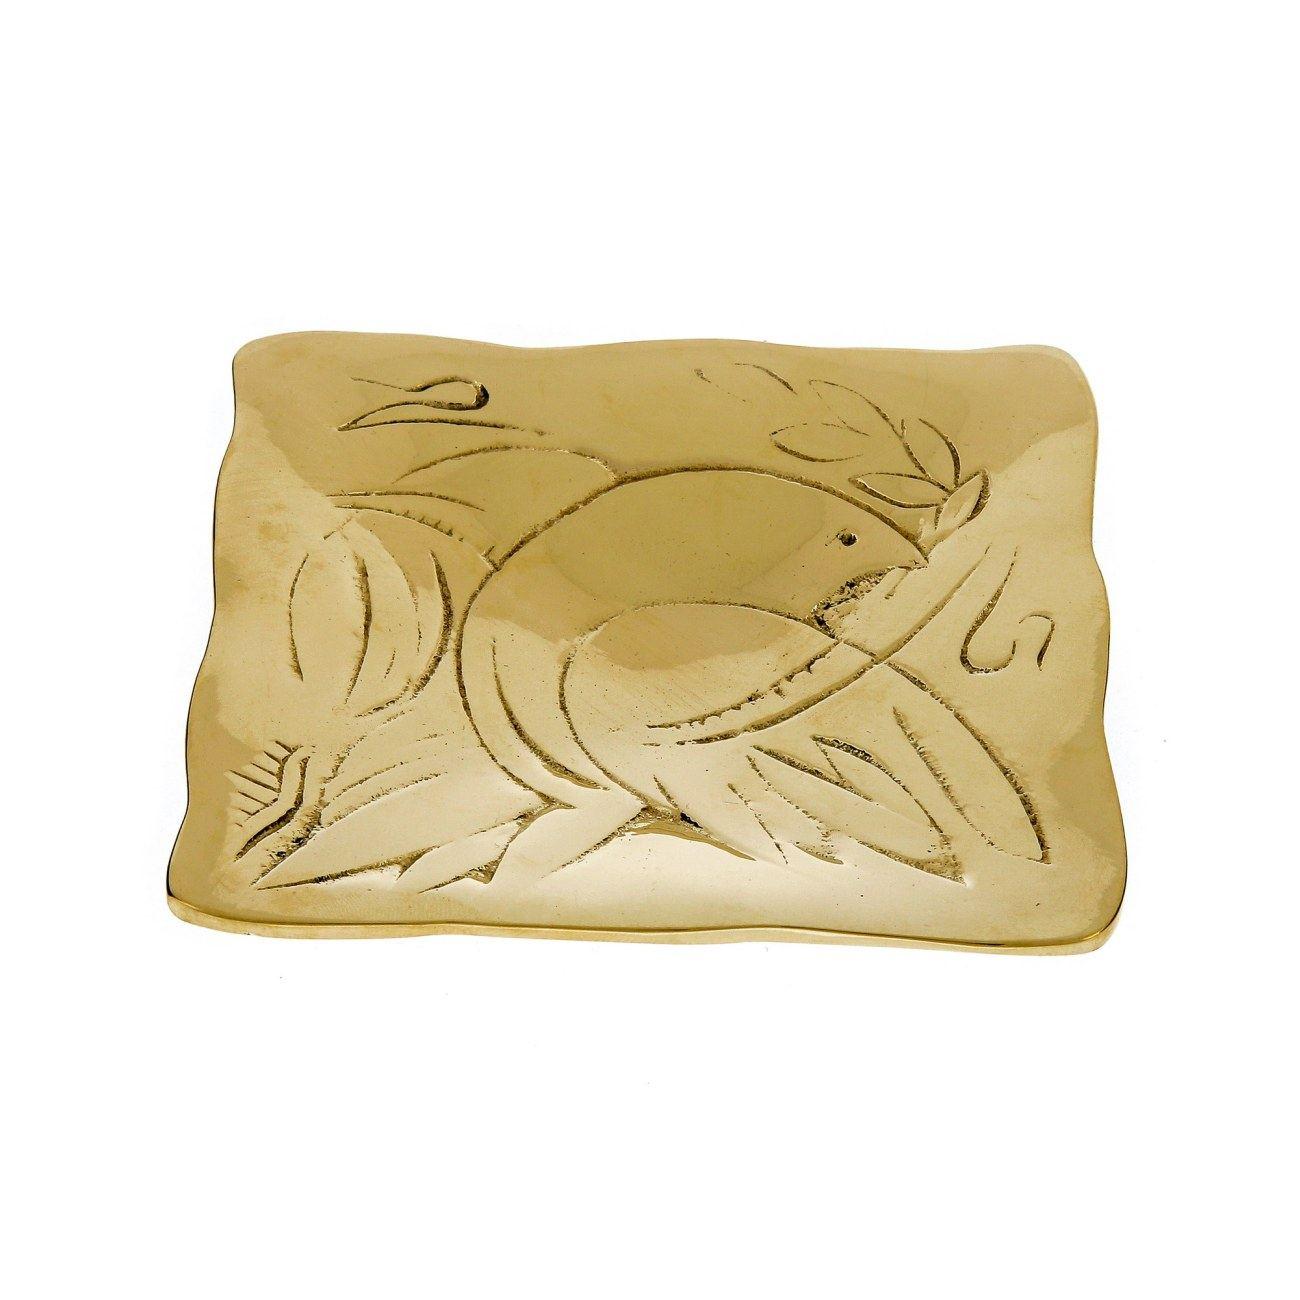 Decorative Metal Plate, Engraved Dove Bird Design - Handmade Solid ...